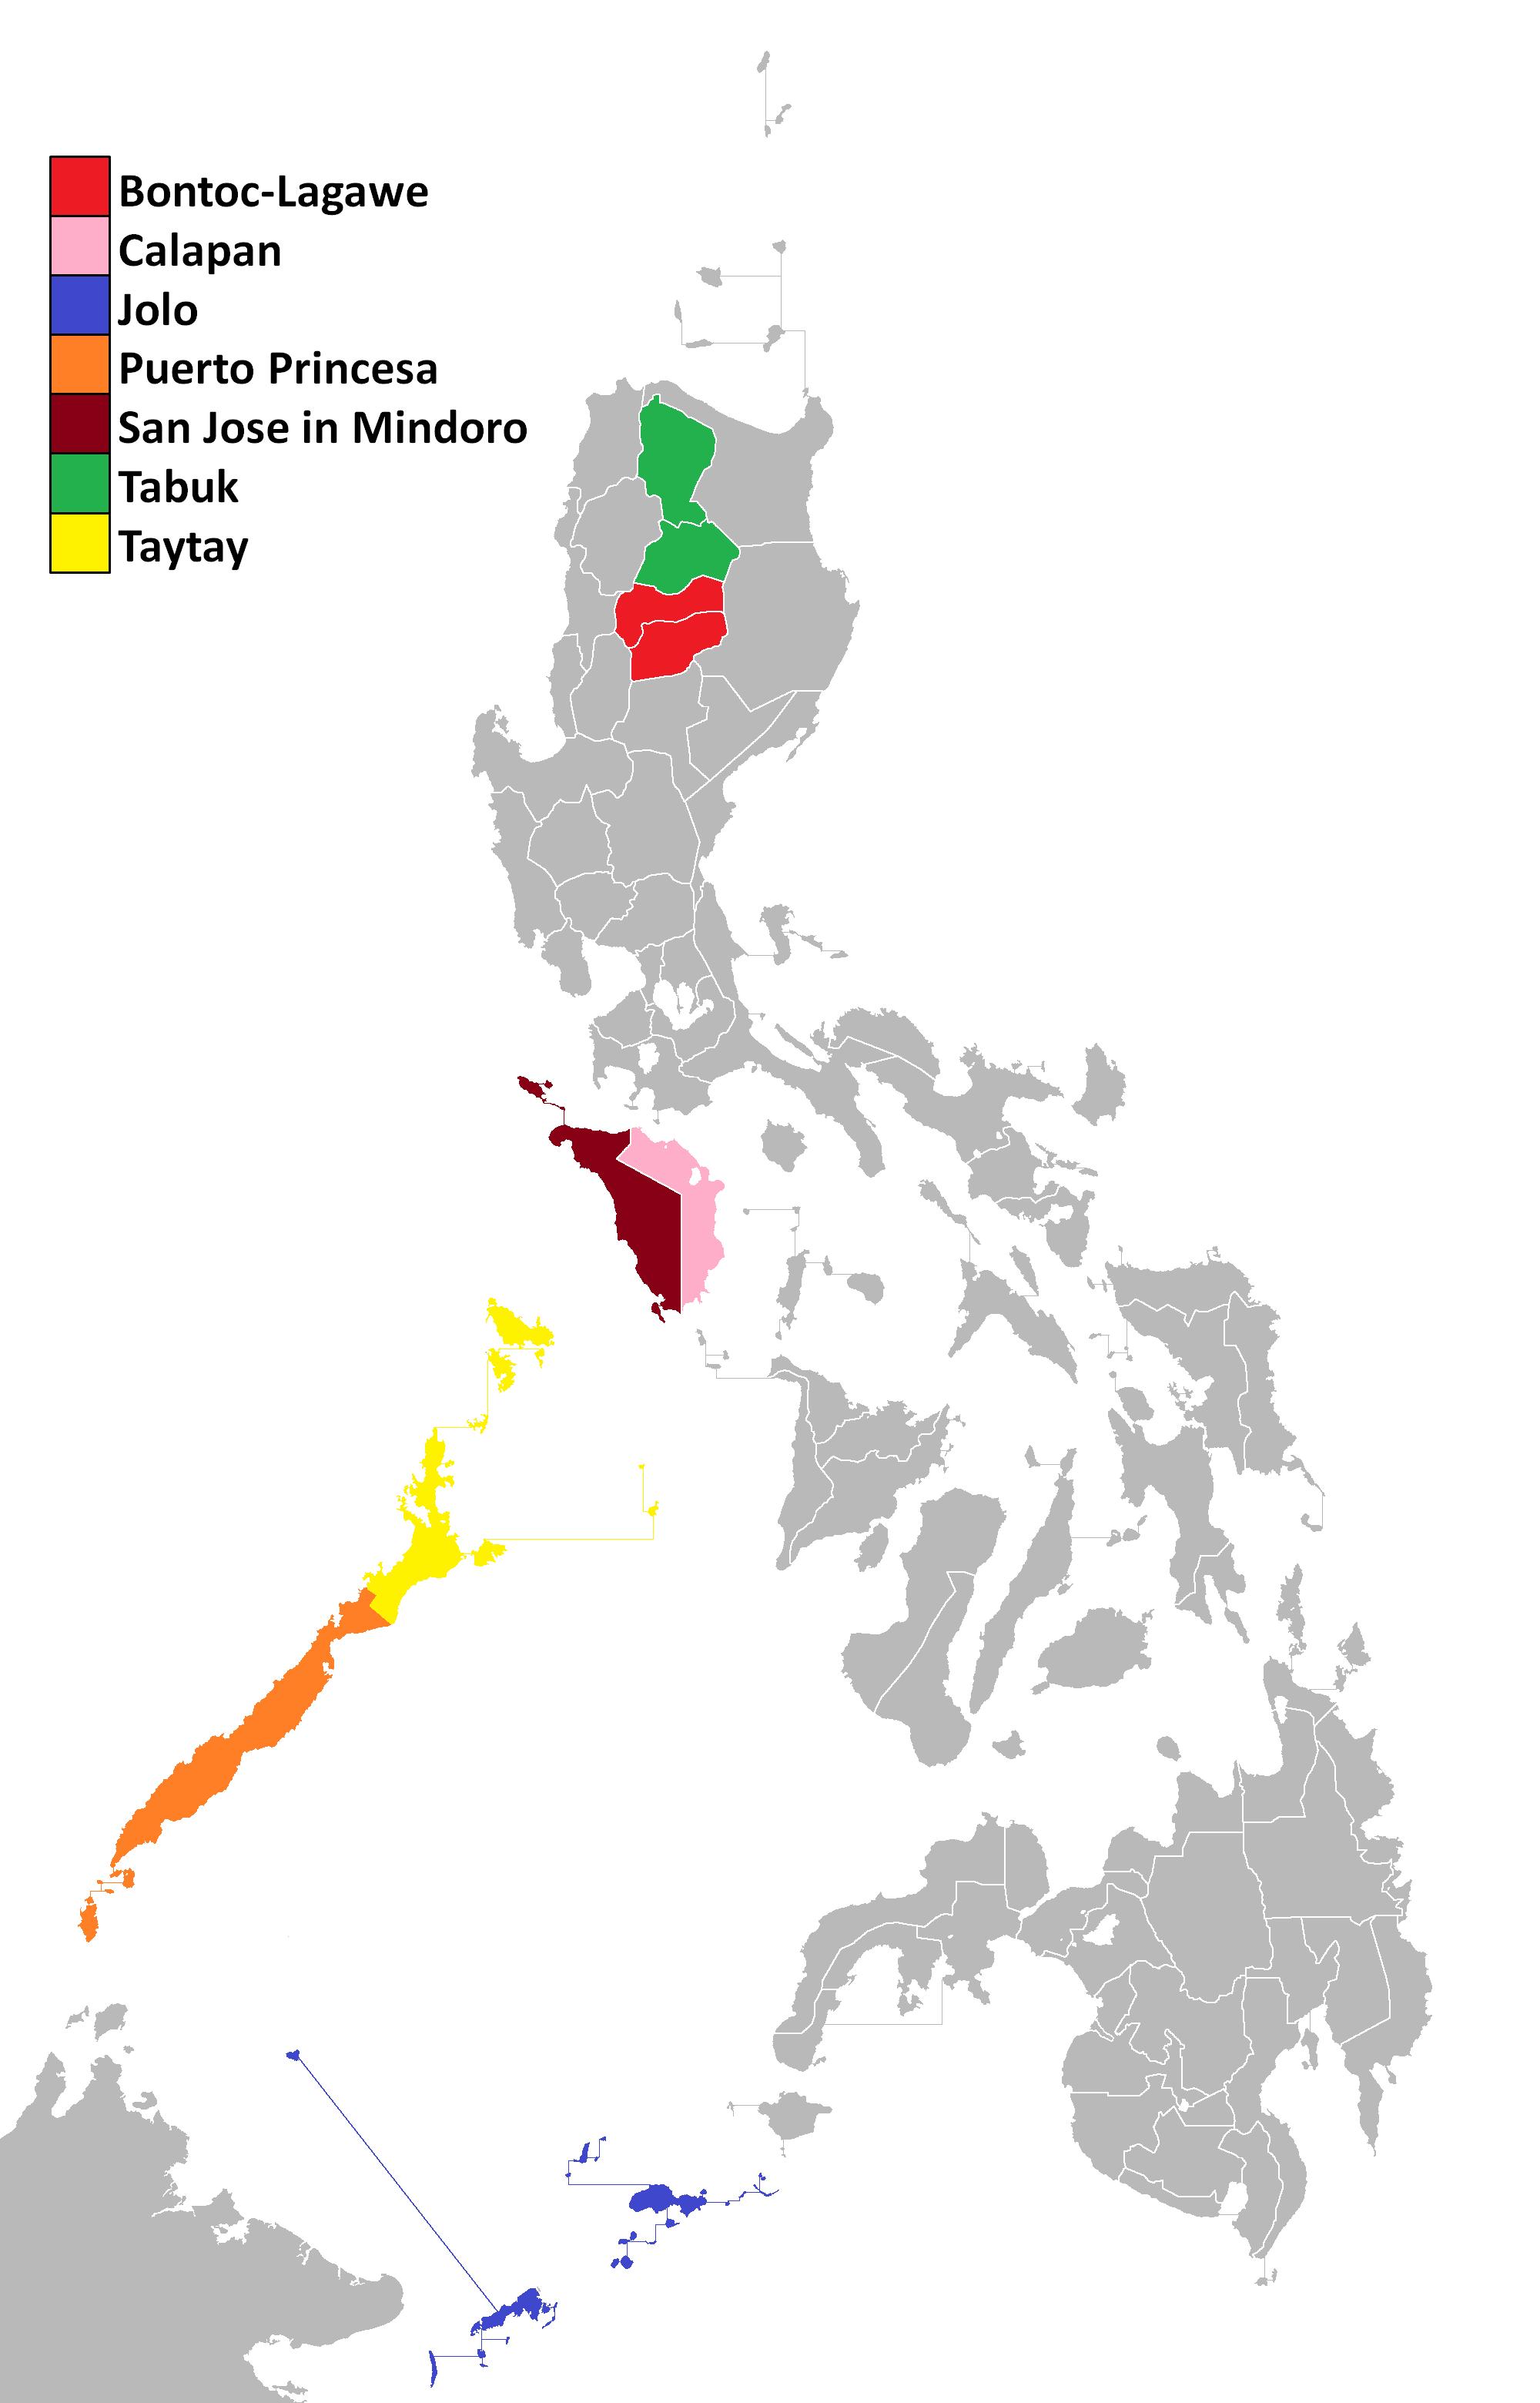 FileRoman Catholic Apostolic Vicariates in the Philippinespng